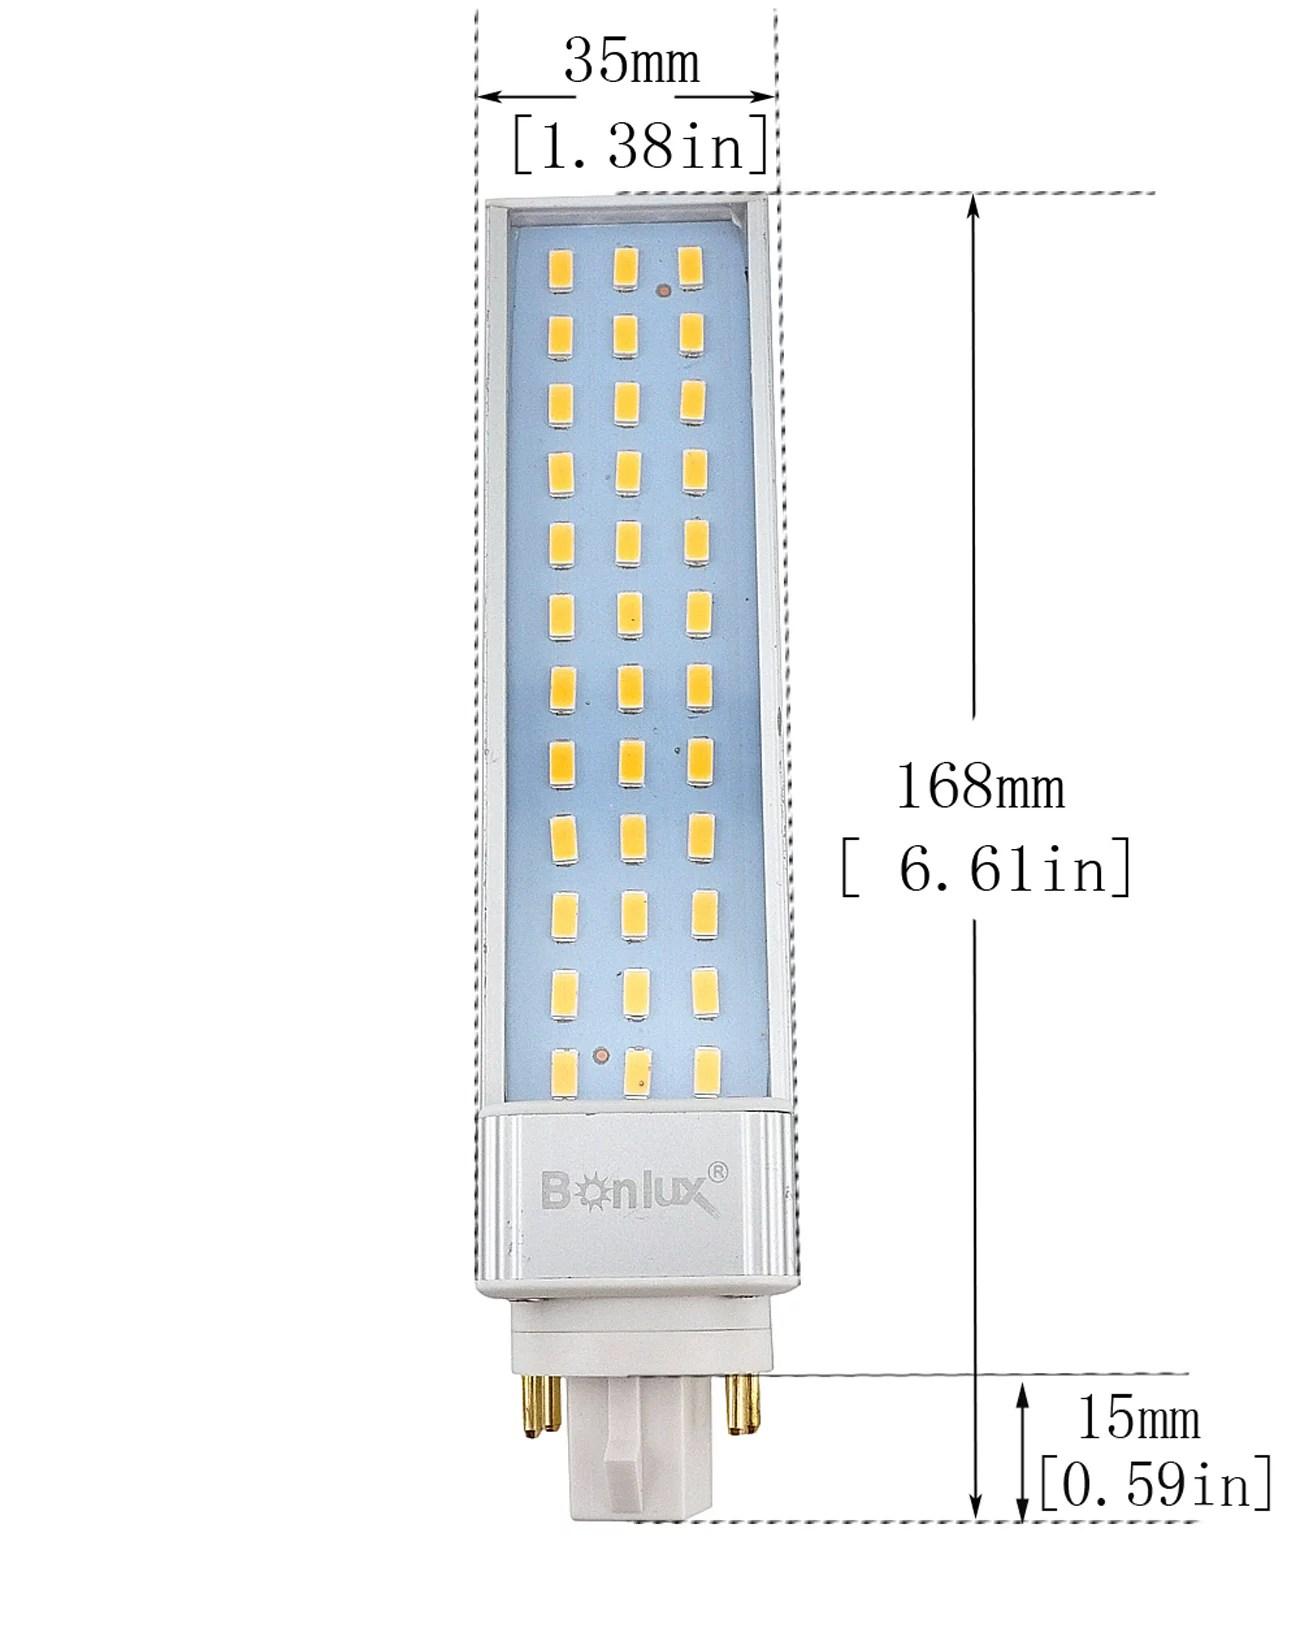 hight resolution of bonlux 13w gx24 rotatable led plc lamp g24q gx24q 4 pin base 26w cfl